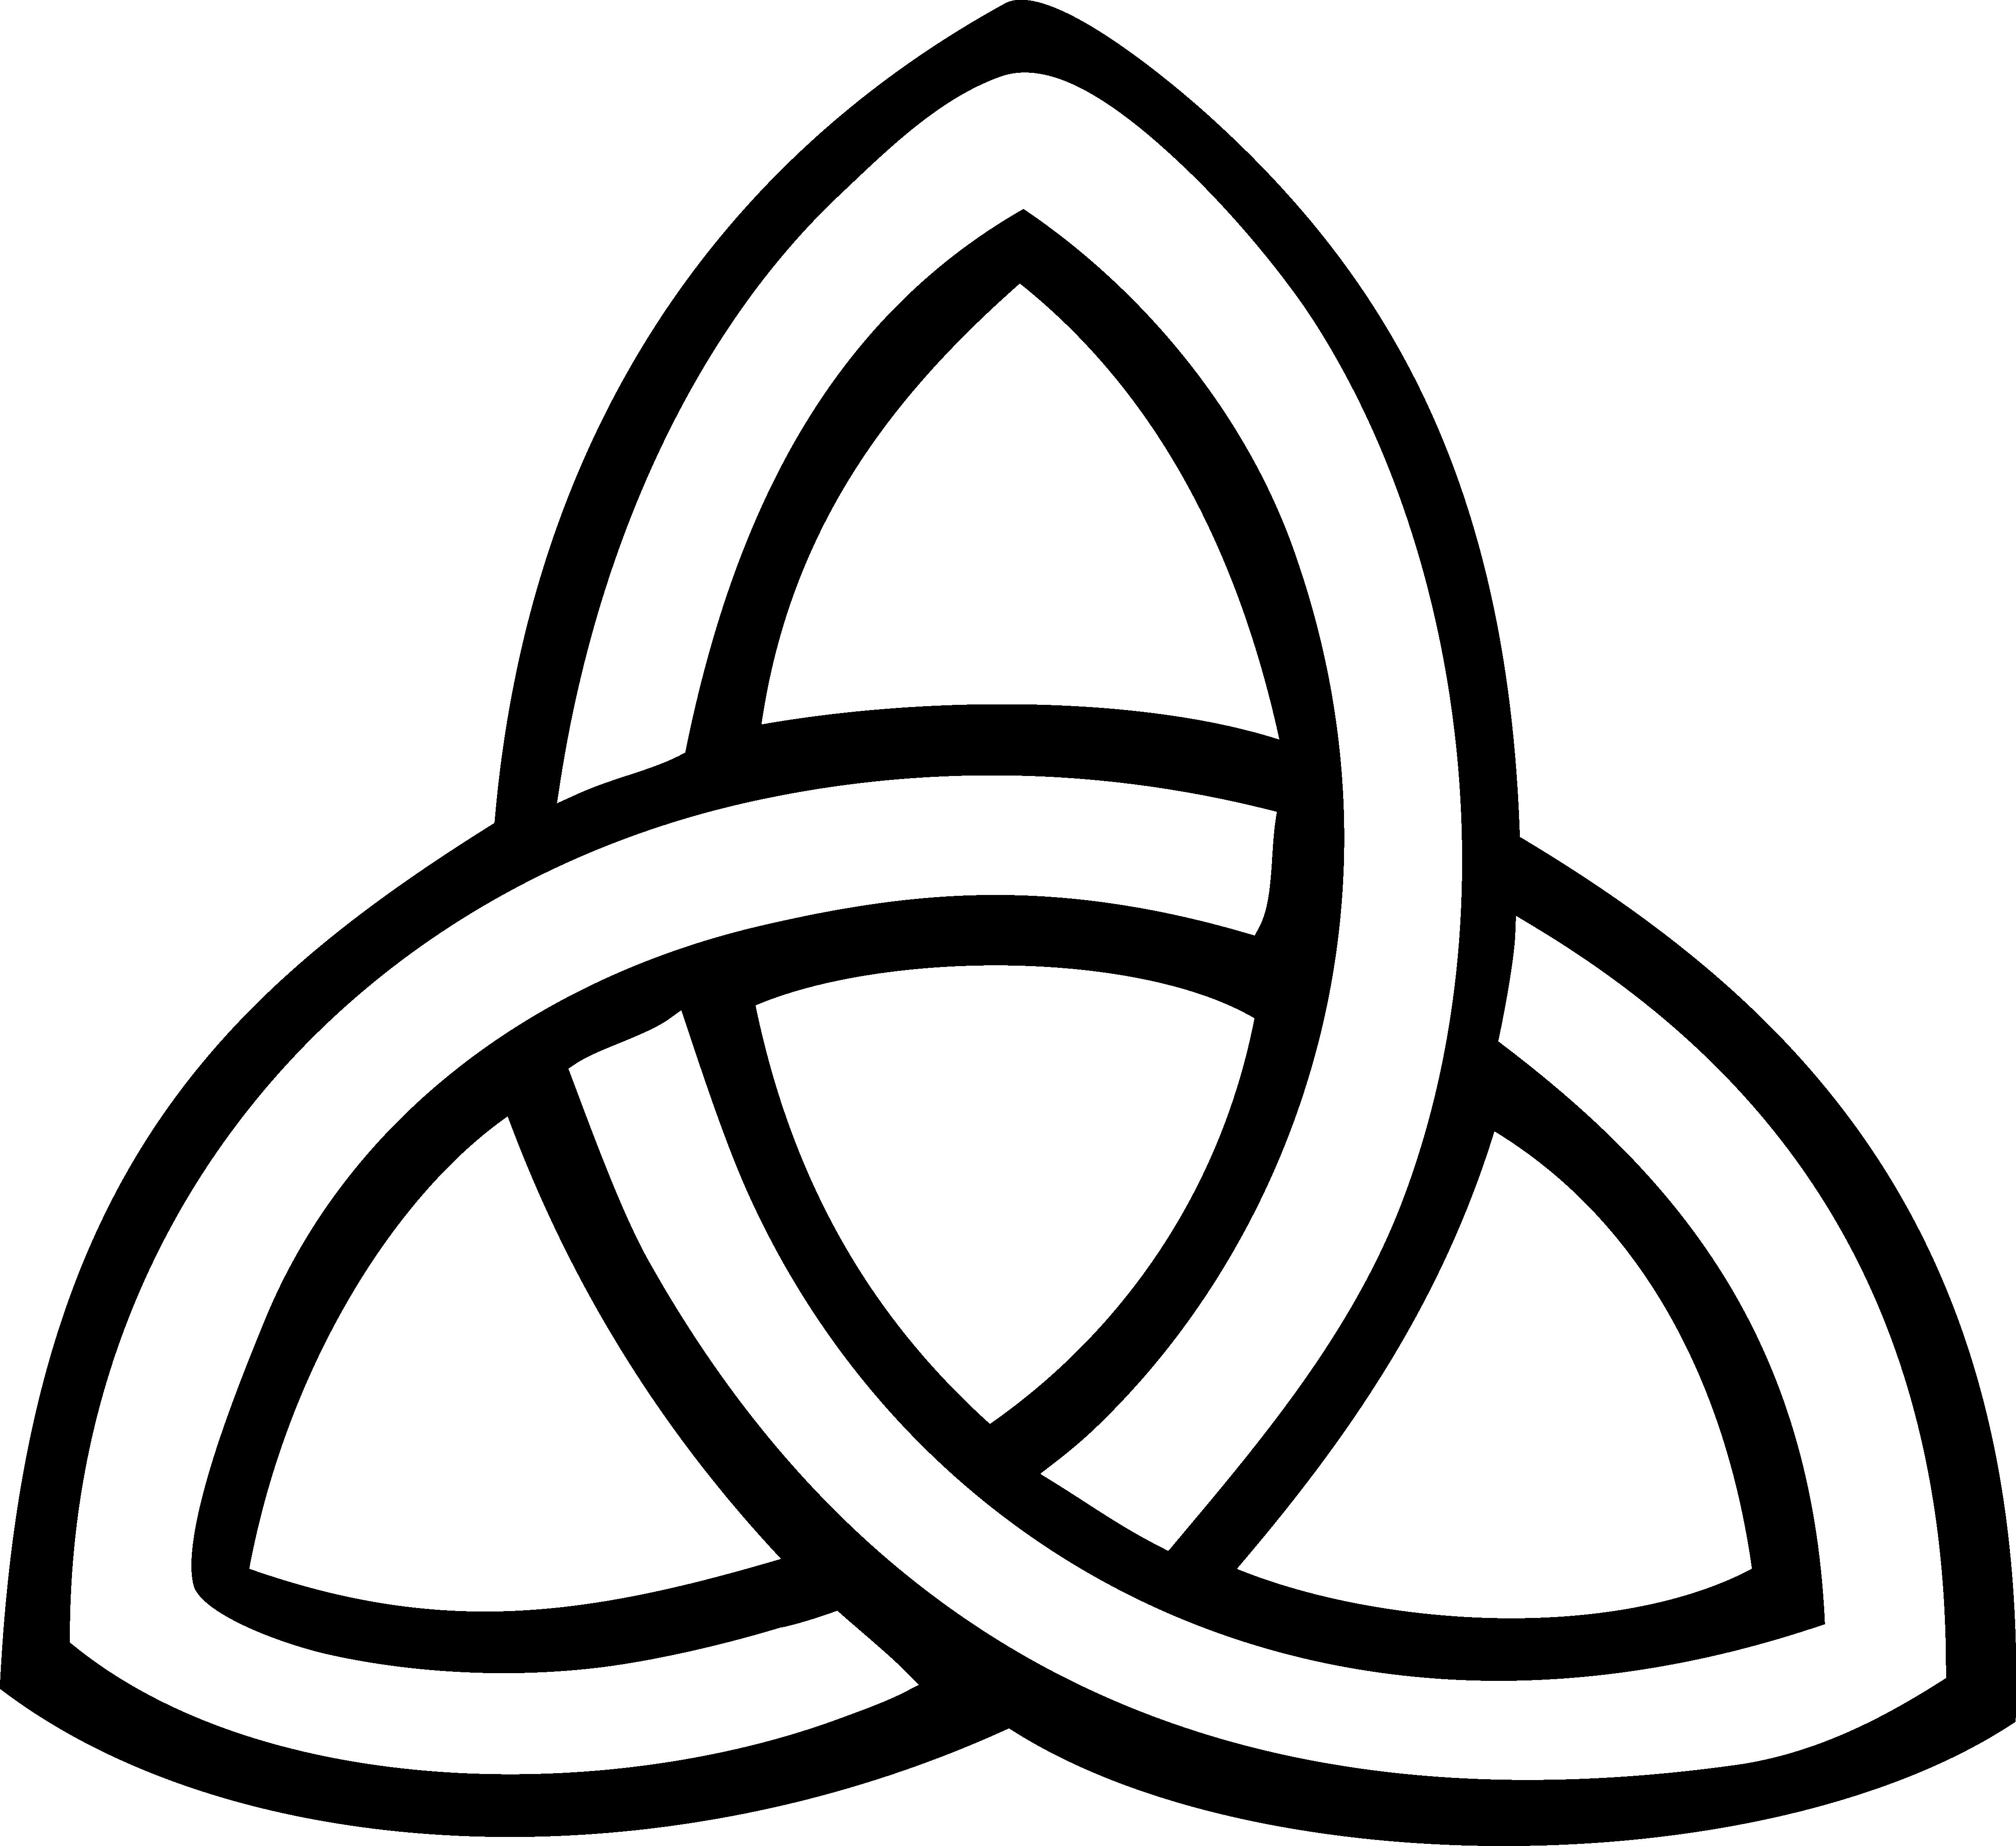 Black and white clipart for united methodist trinity sunday jpg freeuse stock Free Trinity Cliparts, Download Free Clip Art, Free Clip Art on ... jpg freeuse stock